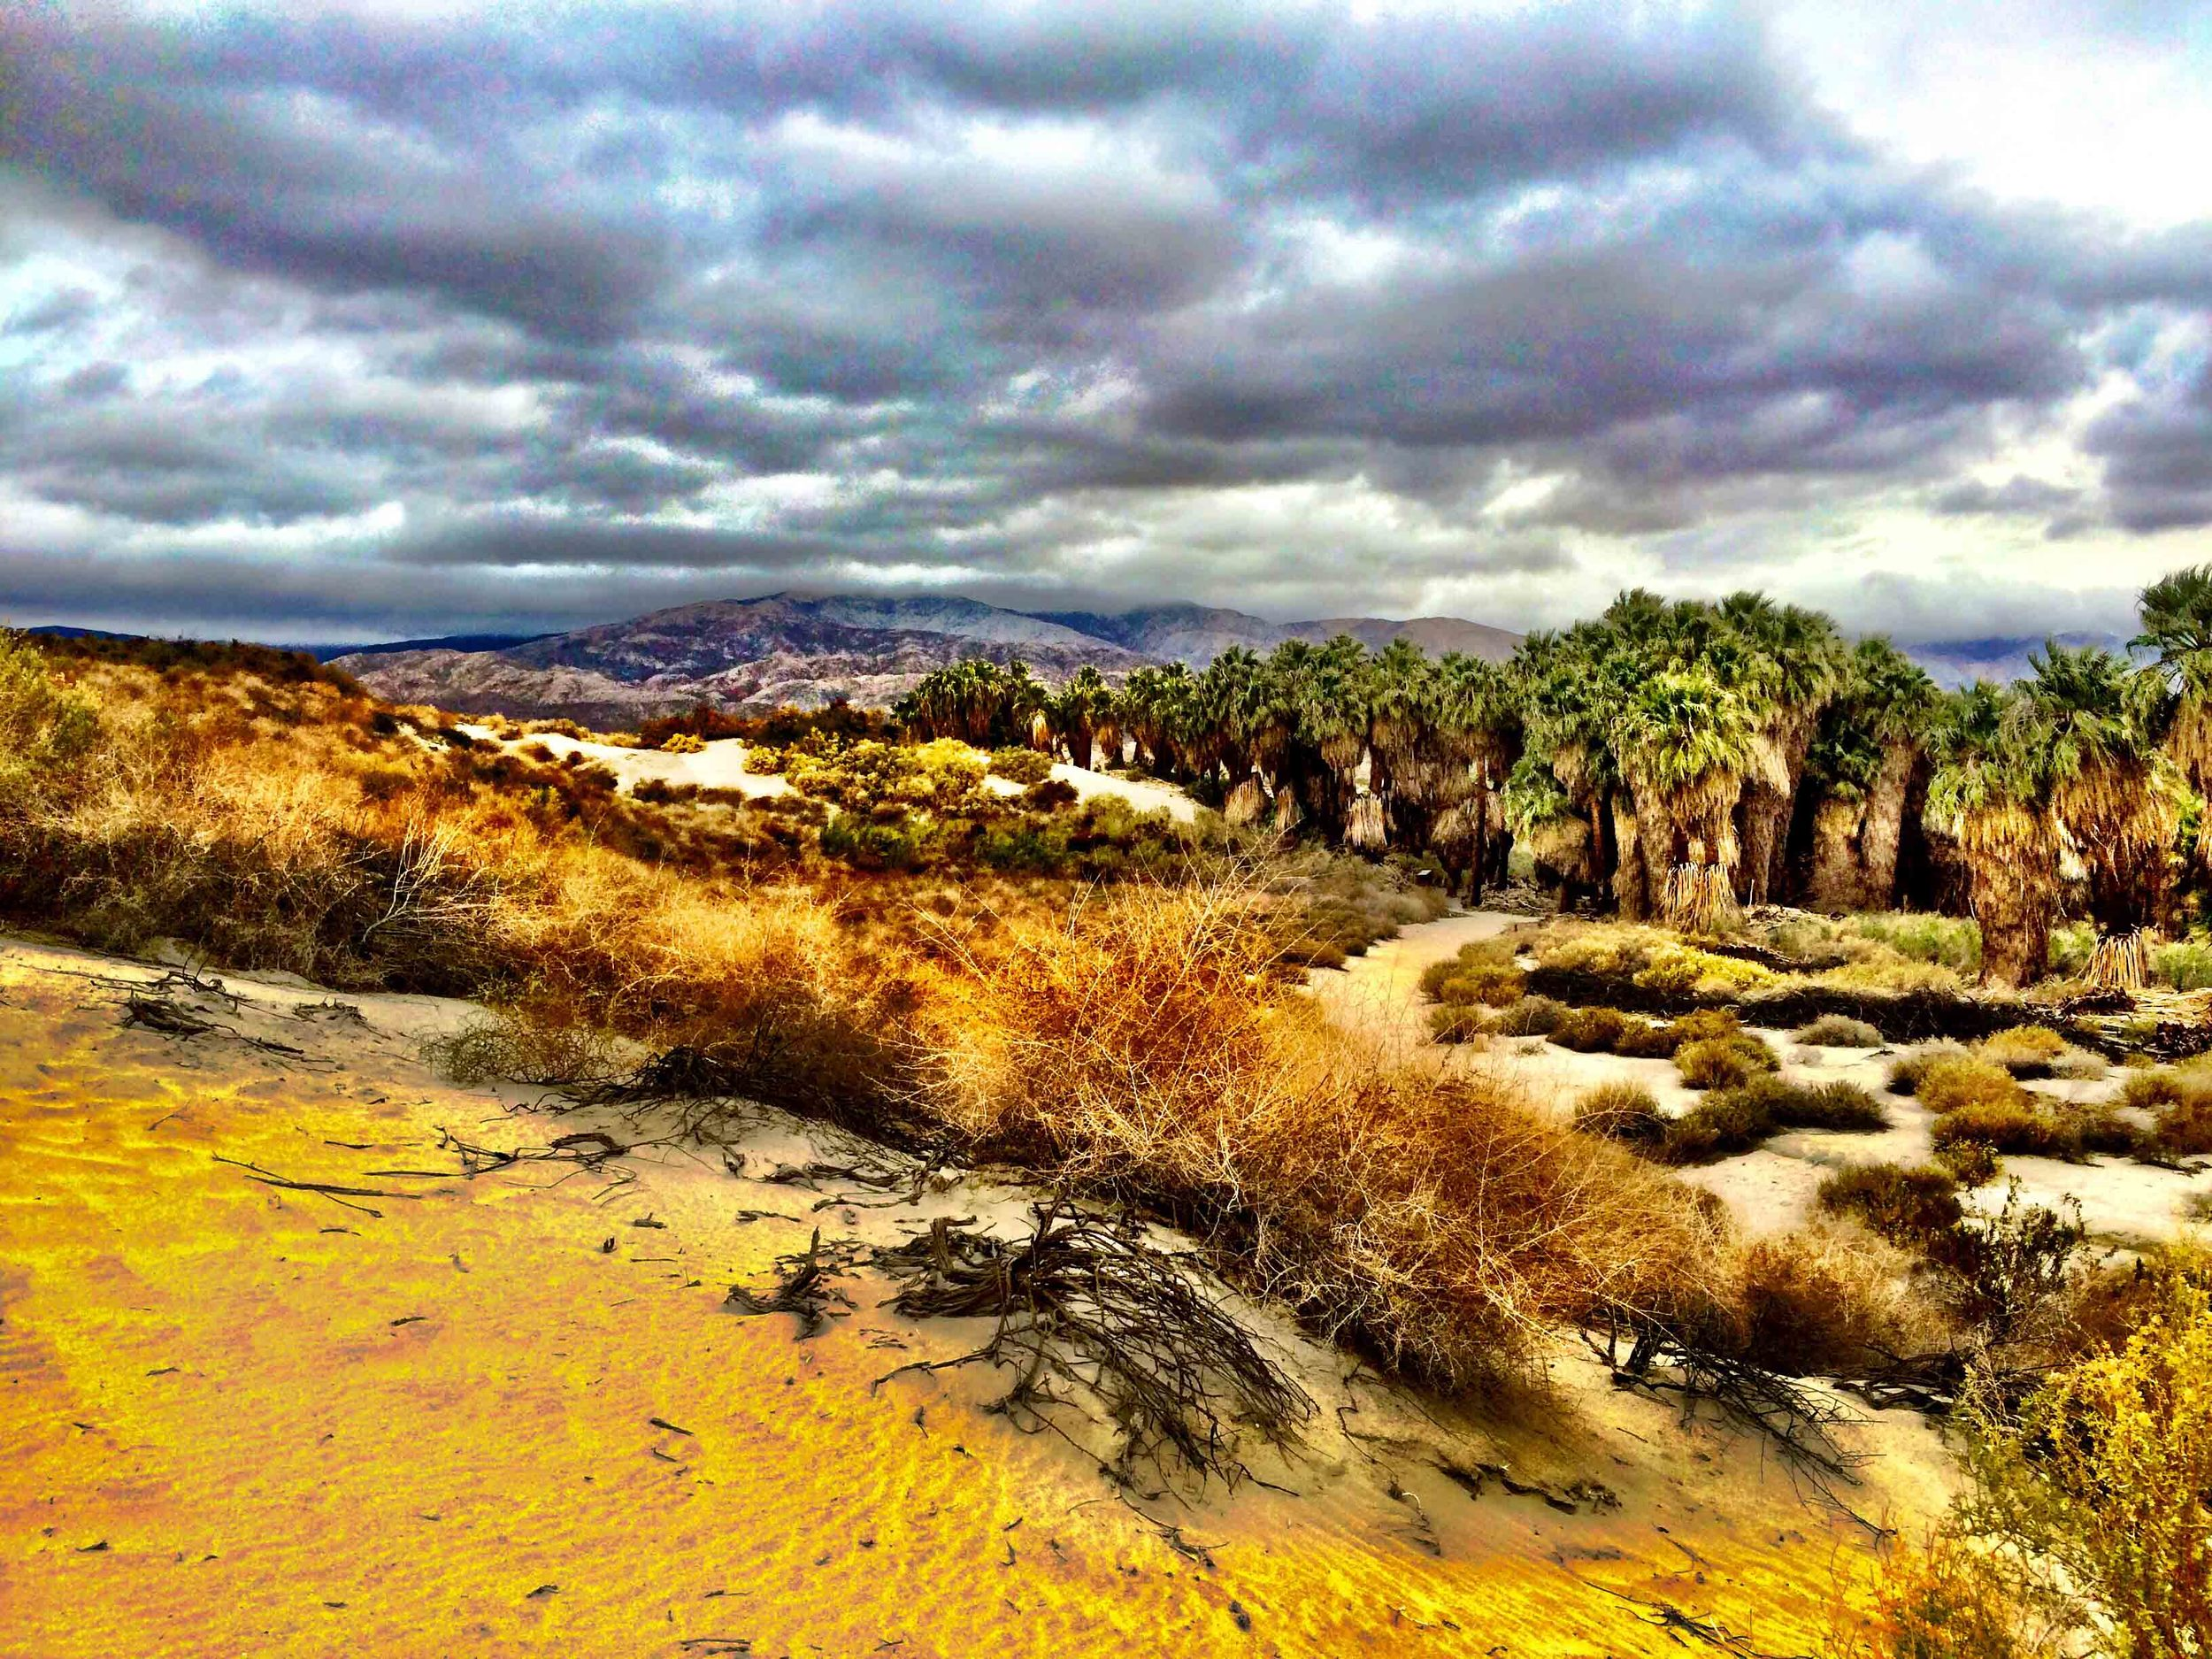 Palm Springs, California, December 2015